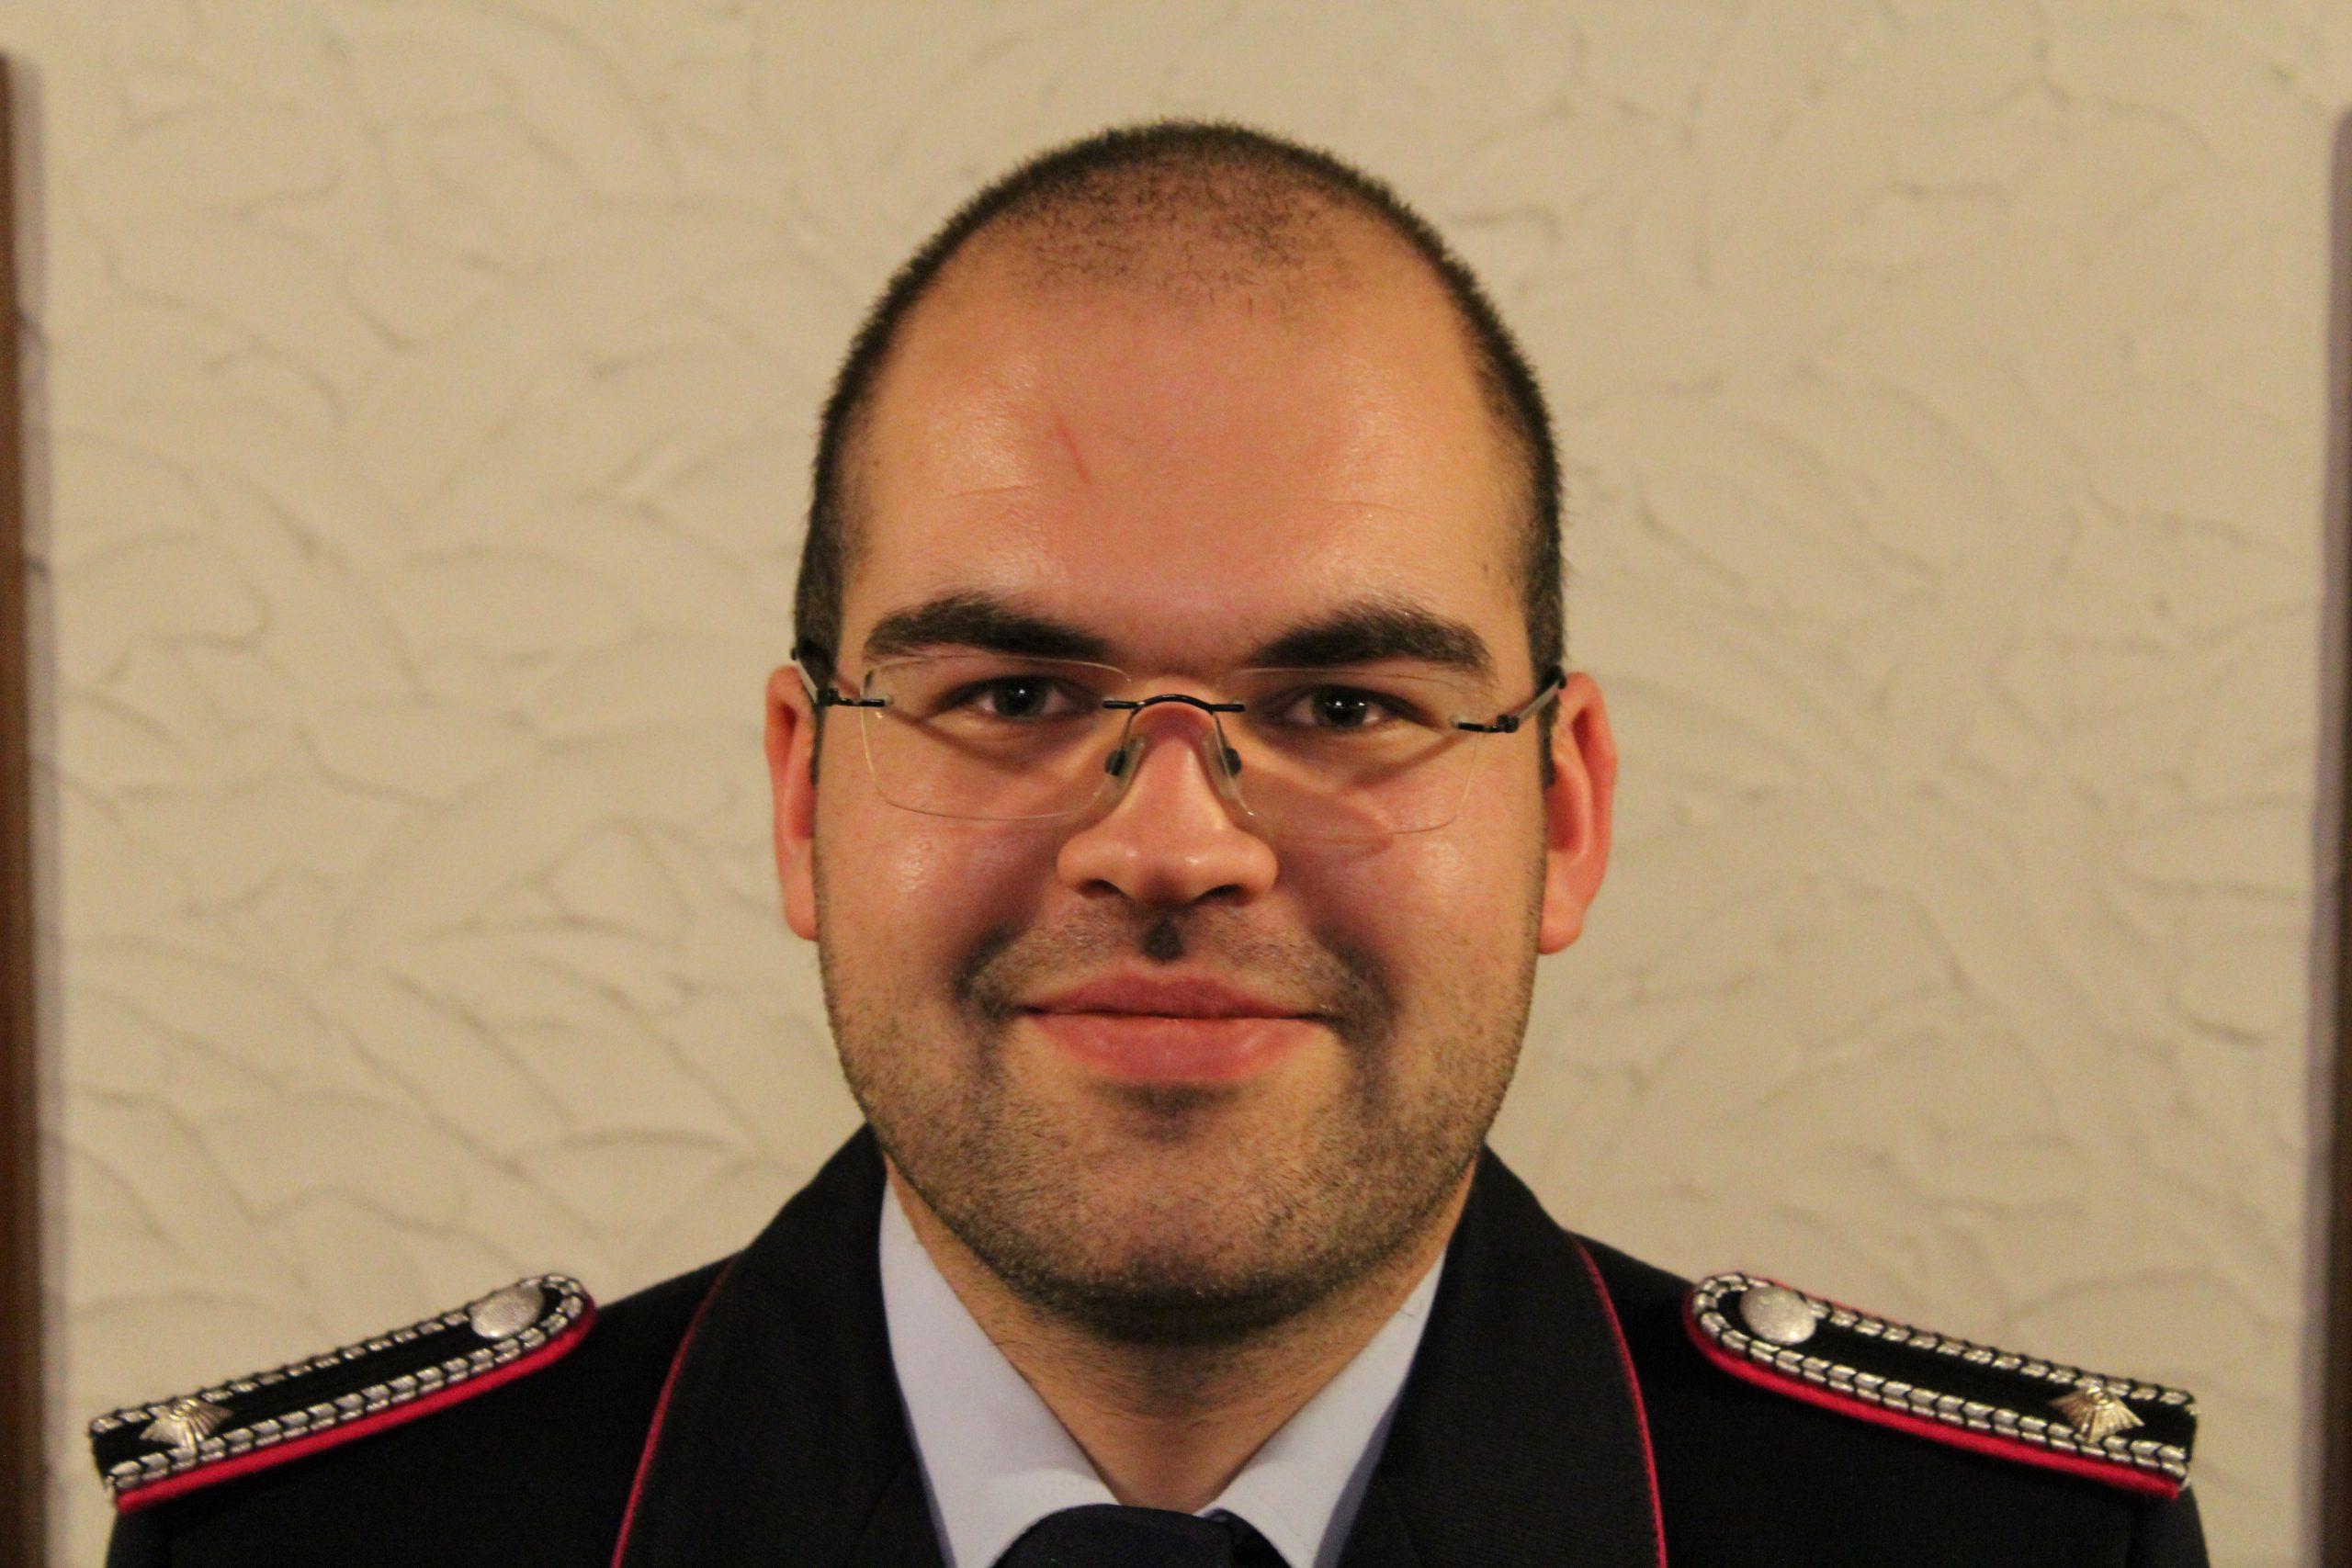 Nils Ohlmeier